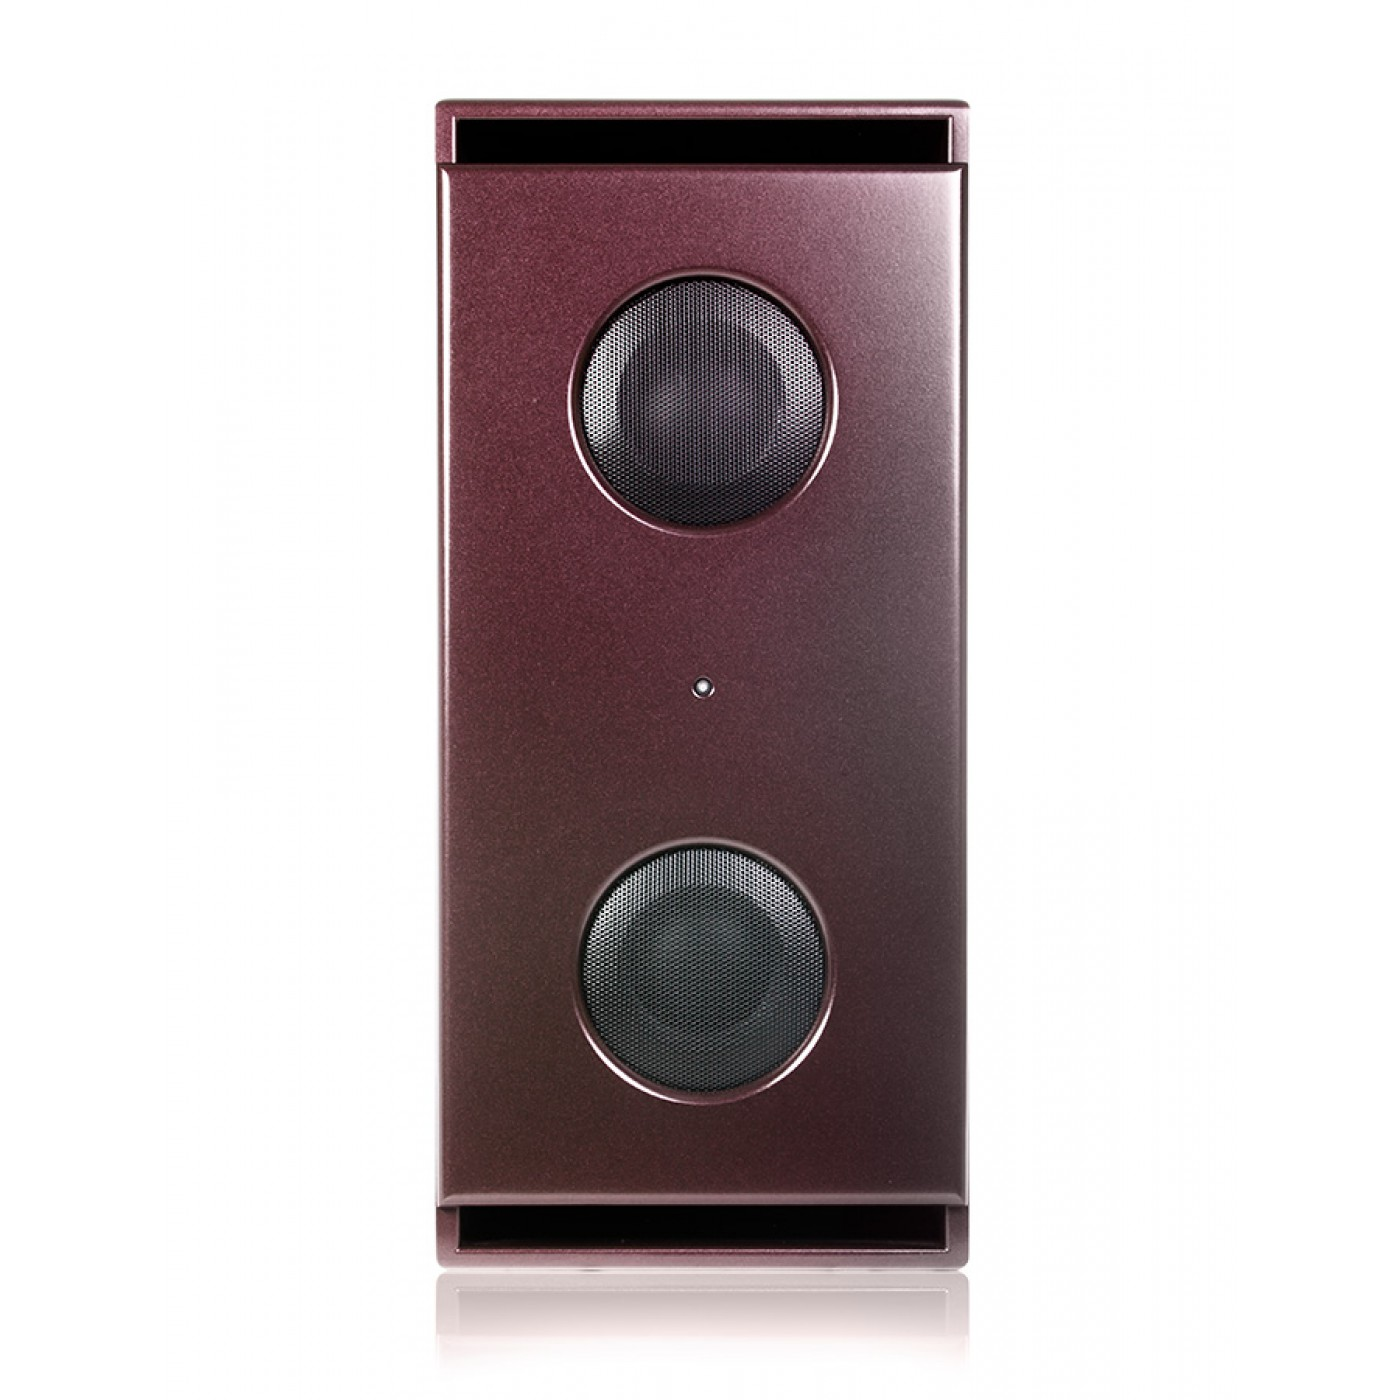 PSI Audio Sub A225M Red Rage Audio